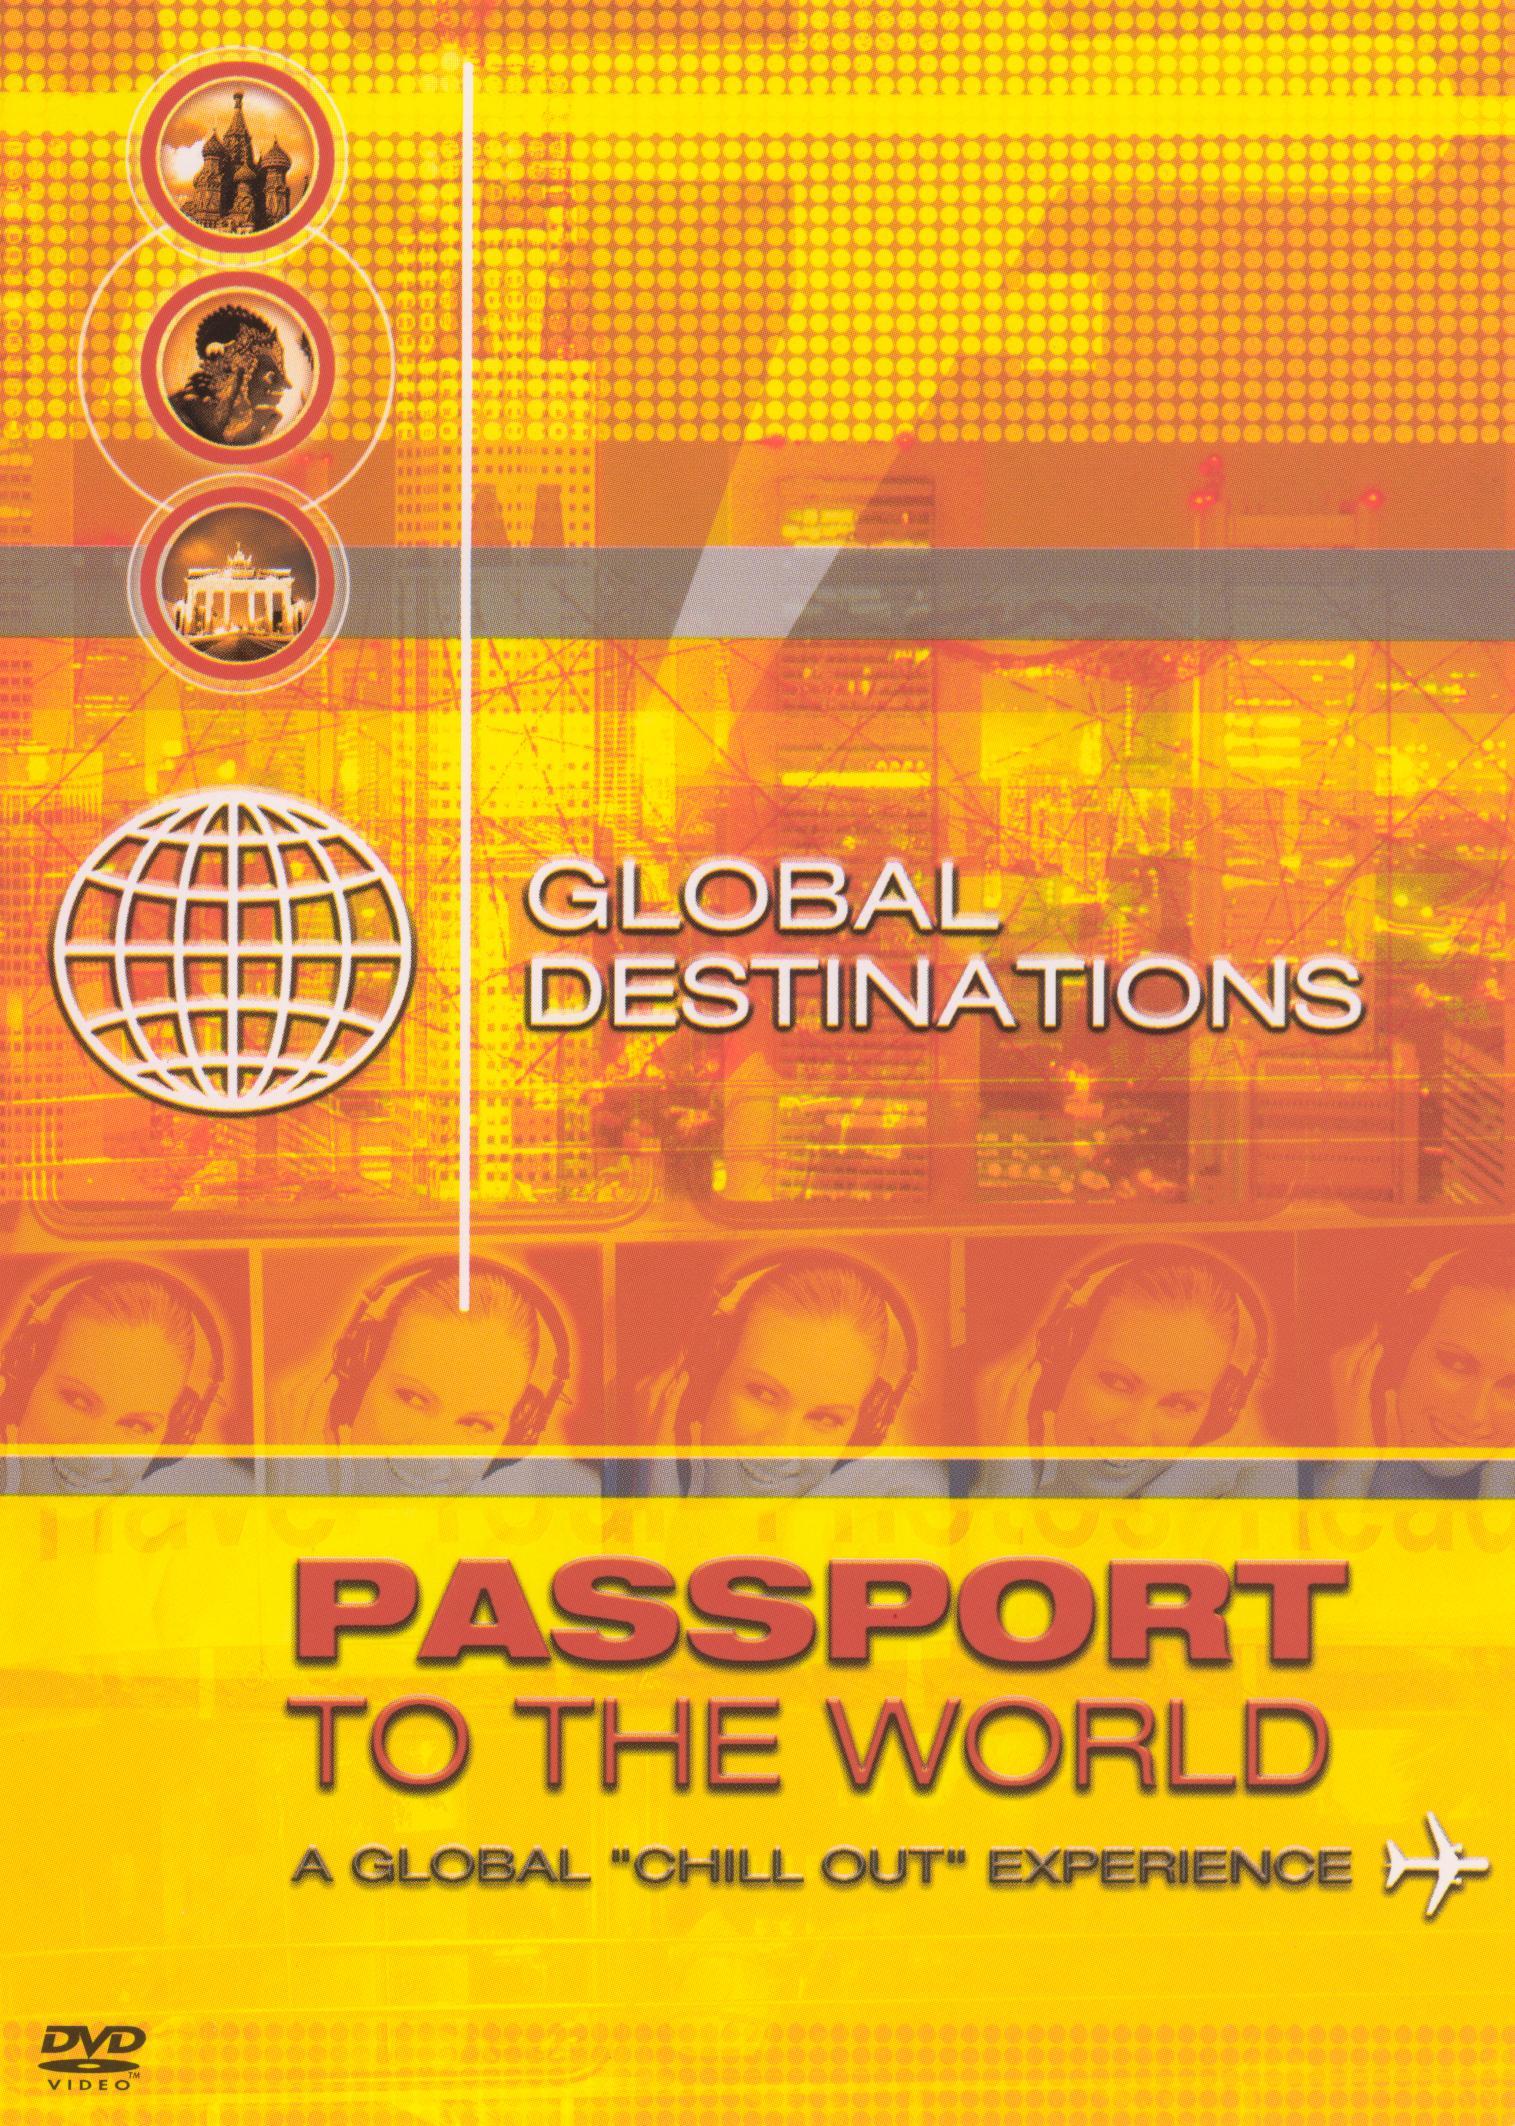 Global Destinations: Passport to the World